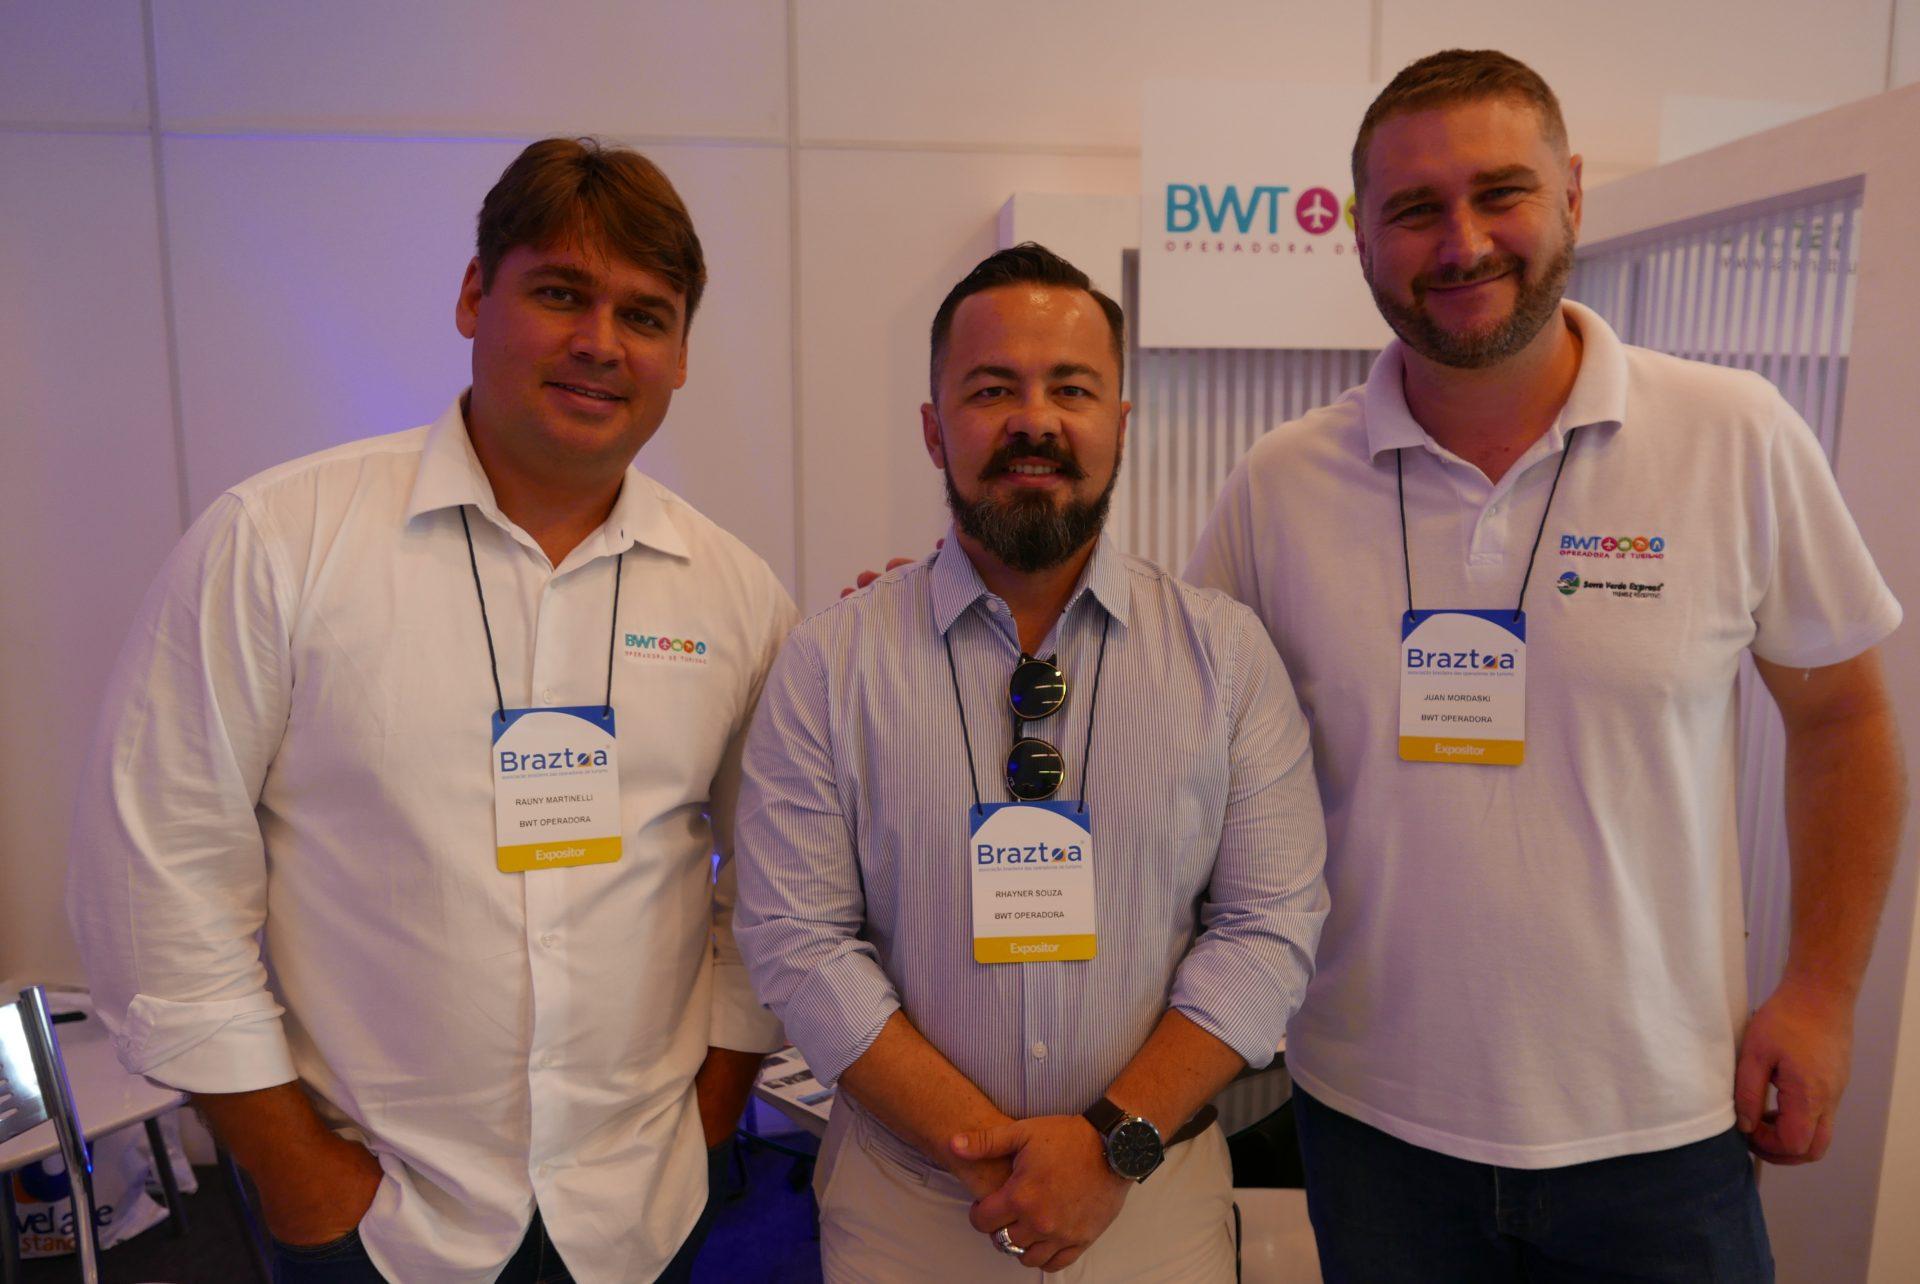 Rauny Martinelli, Rhayner Souza, e Juan Mordaski, da BWT Operadora